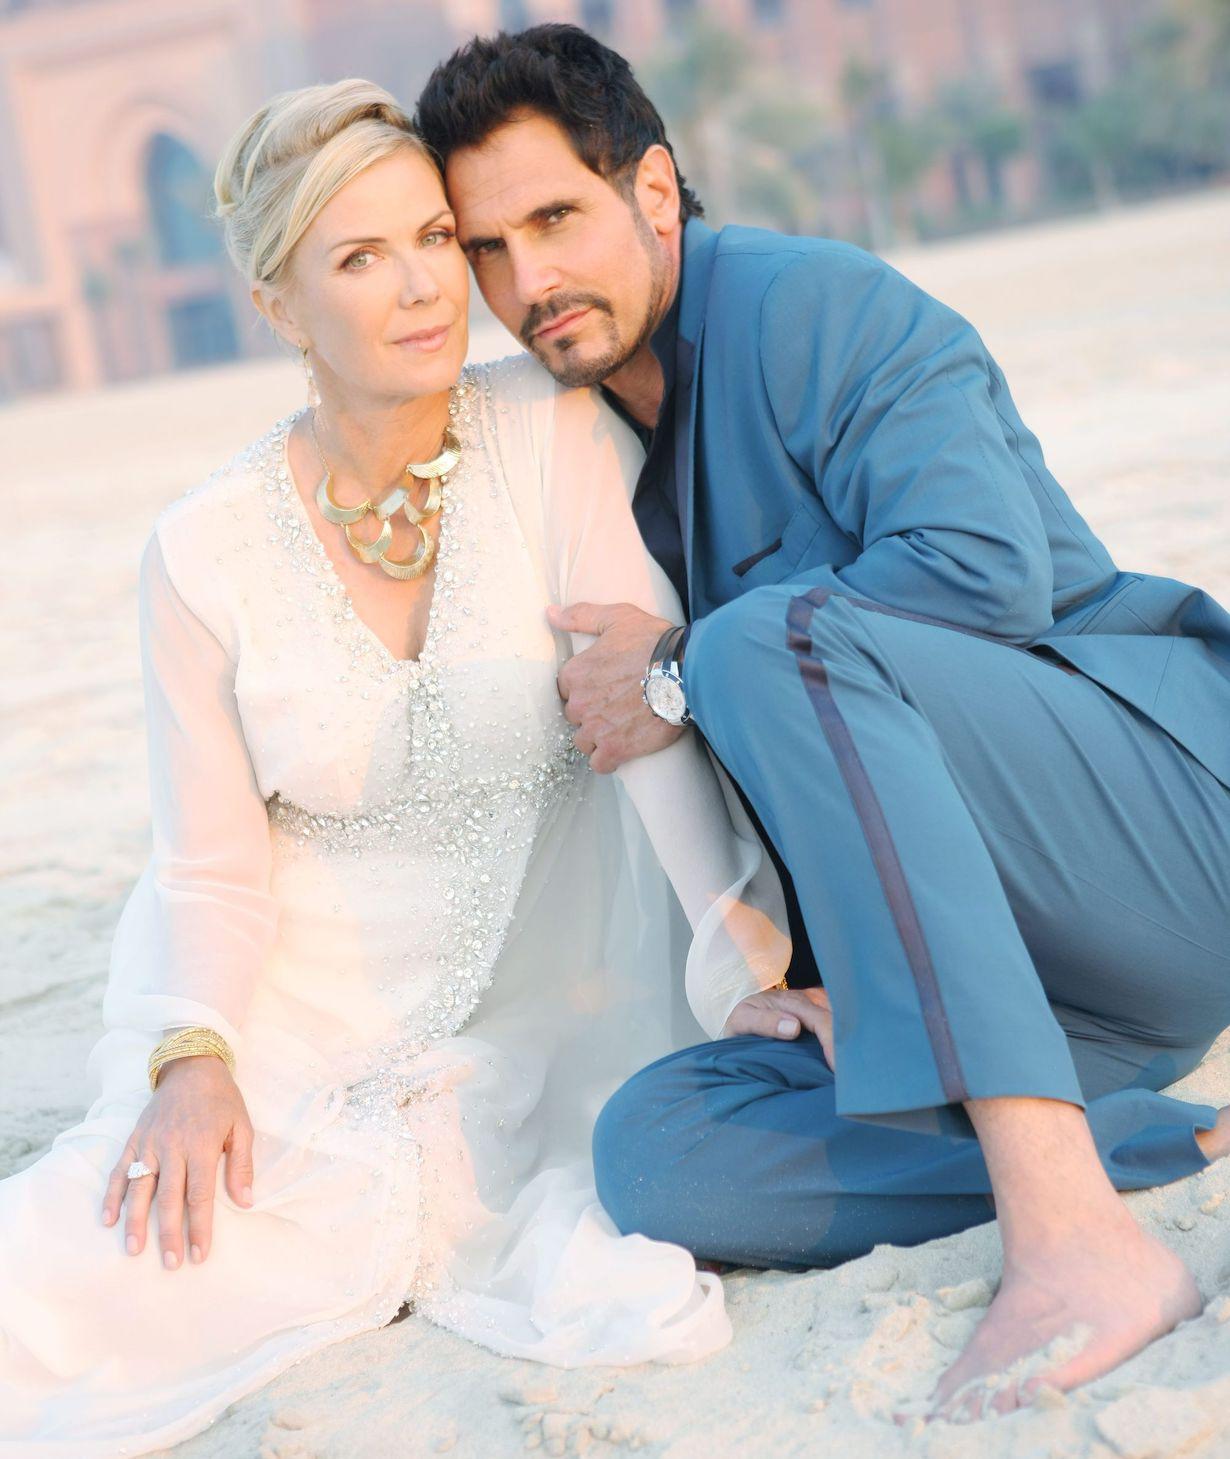 "Katherine Kelly Lang, Don Diamont ""The Bold and the Beautiful"" 2nd Day of Shooting on Location in Dubai United Arab Emirates, Dubai 03/18/14 © Sean Smith/jpistudios.com 310-657-9661"